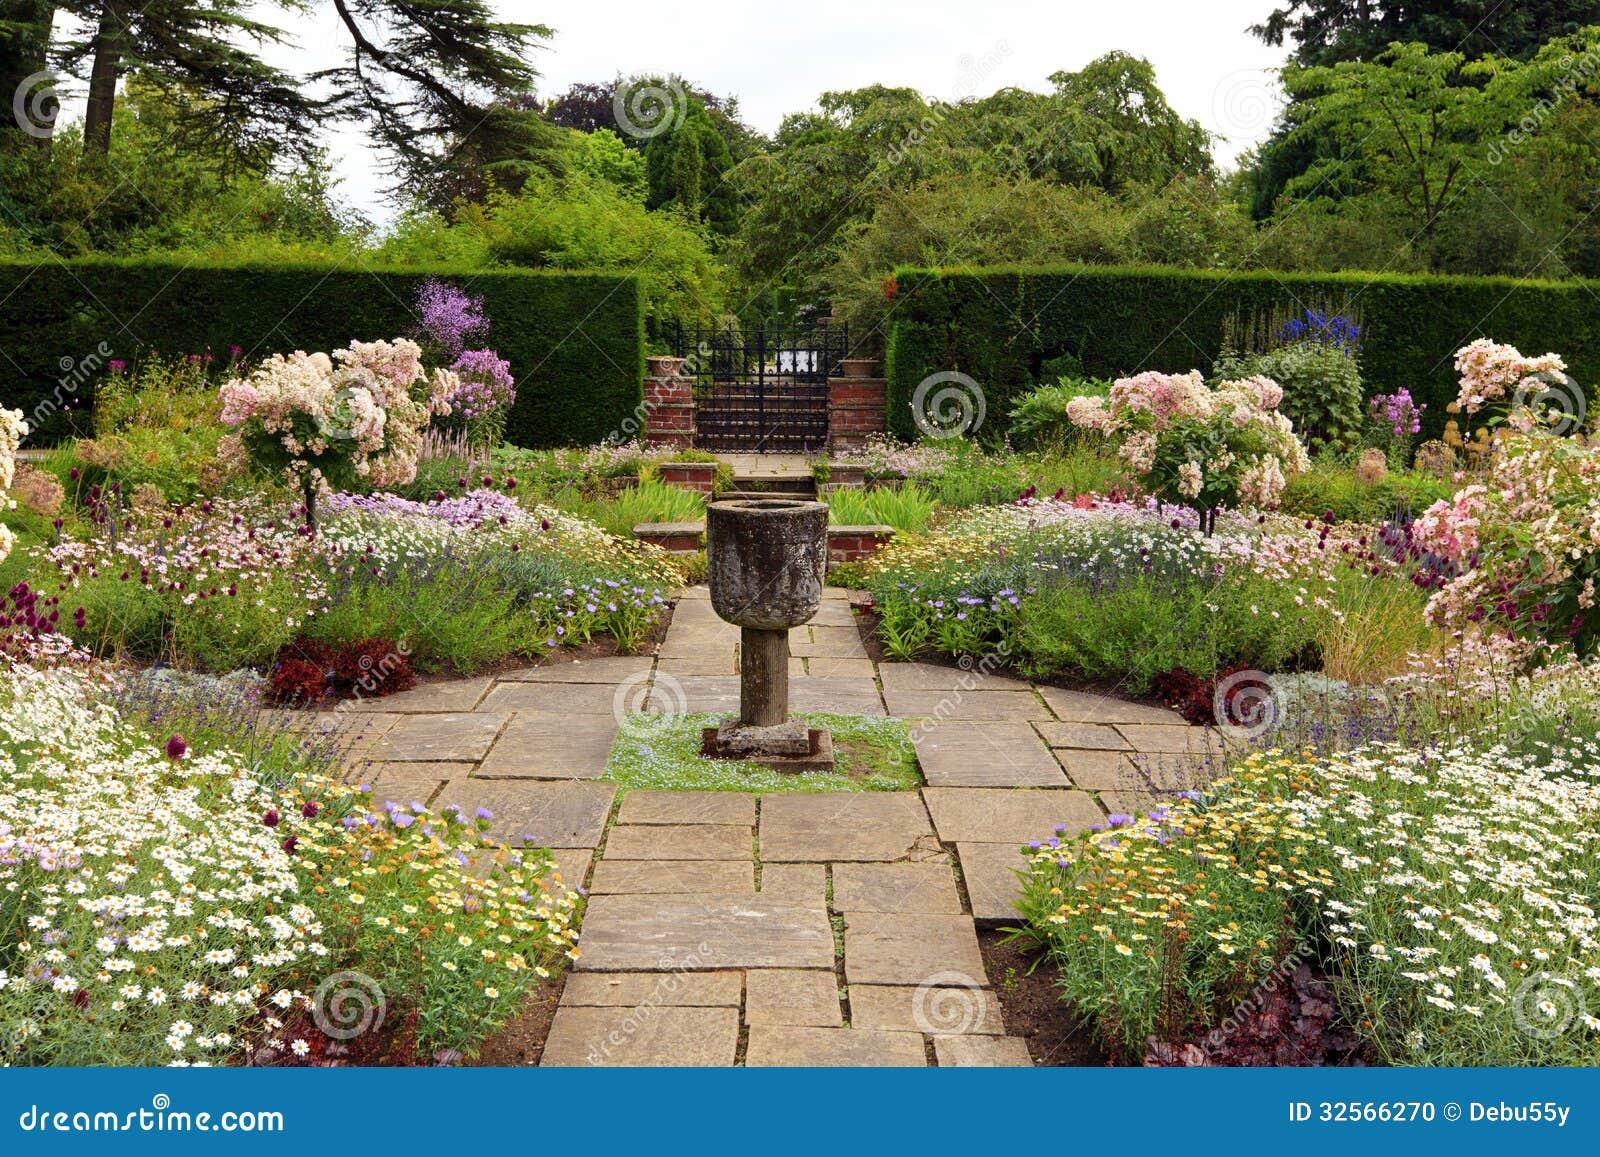 Formal English Garden Design LONG HAIRSTYLES